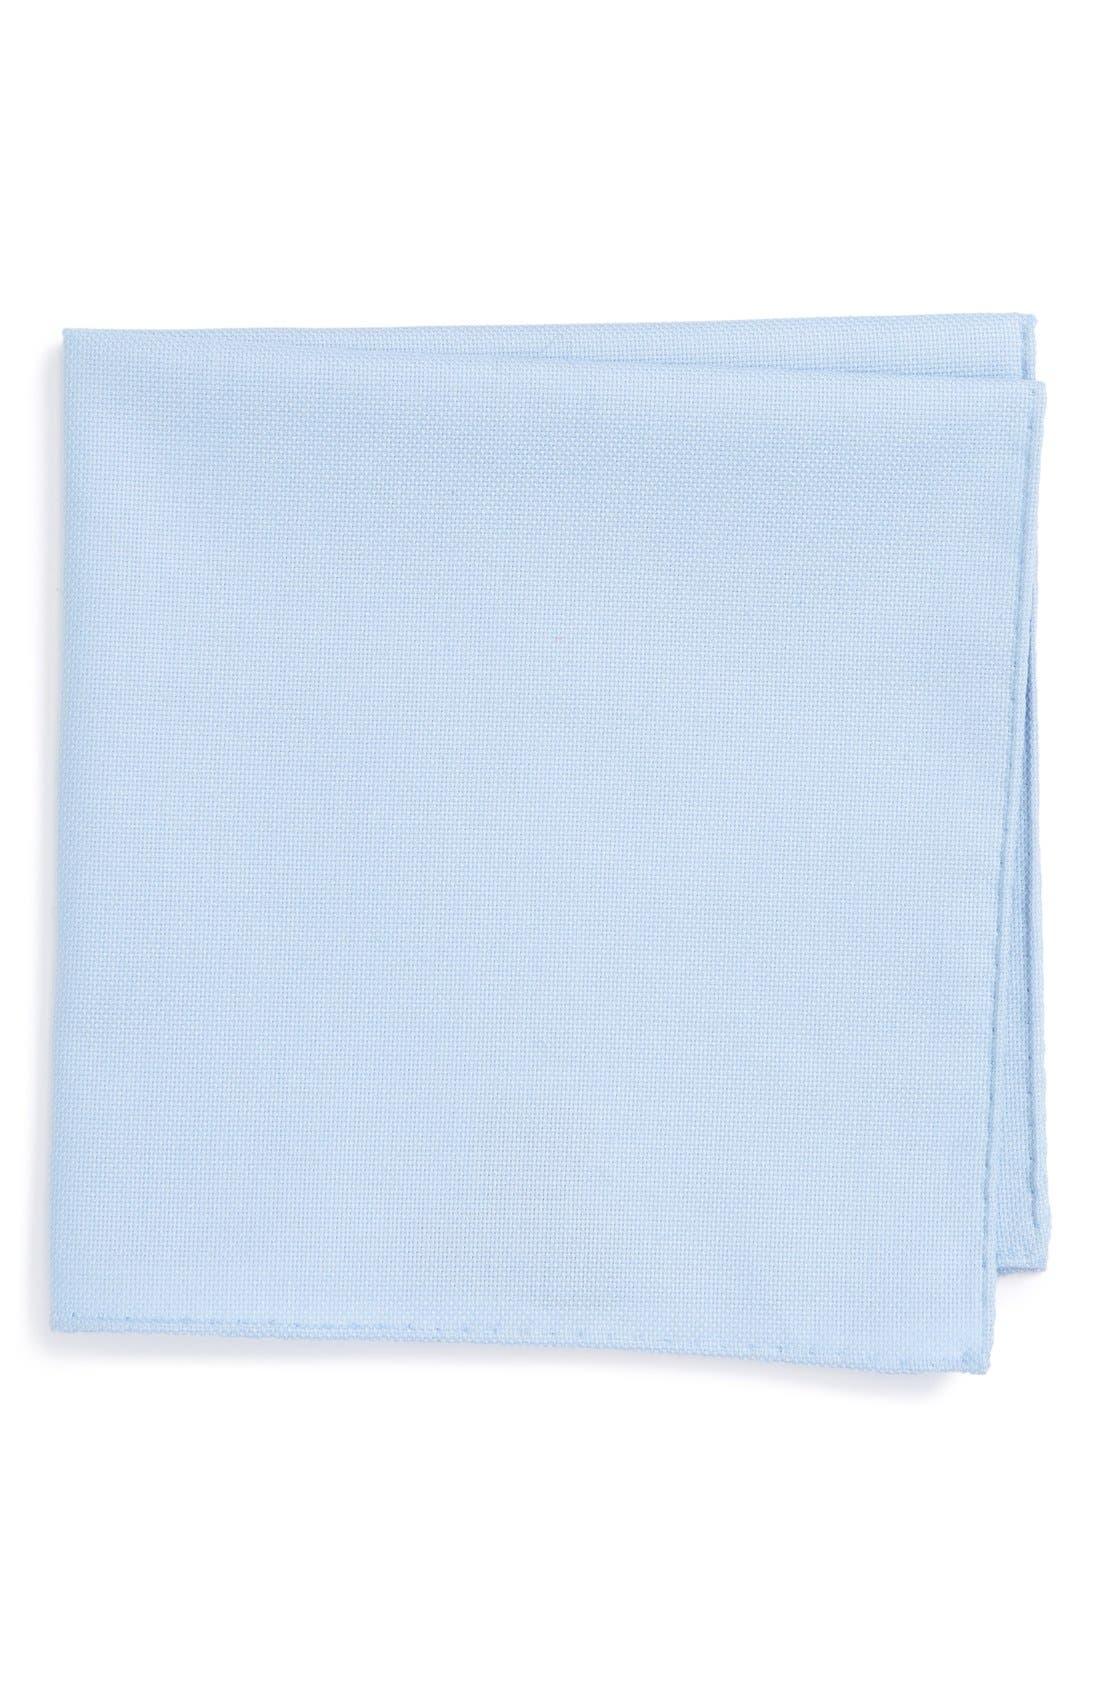 Solid Cotton Pocket Square,                             Main thumbnail 1, color,                             Blue